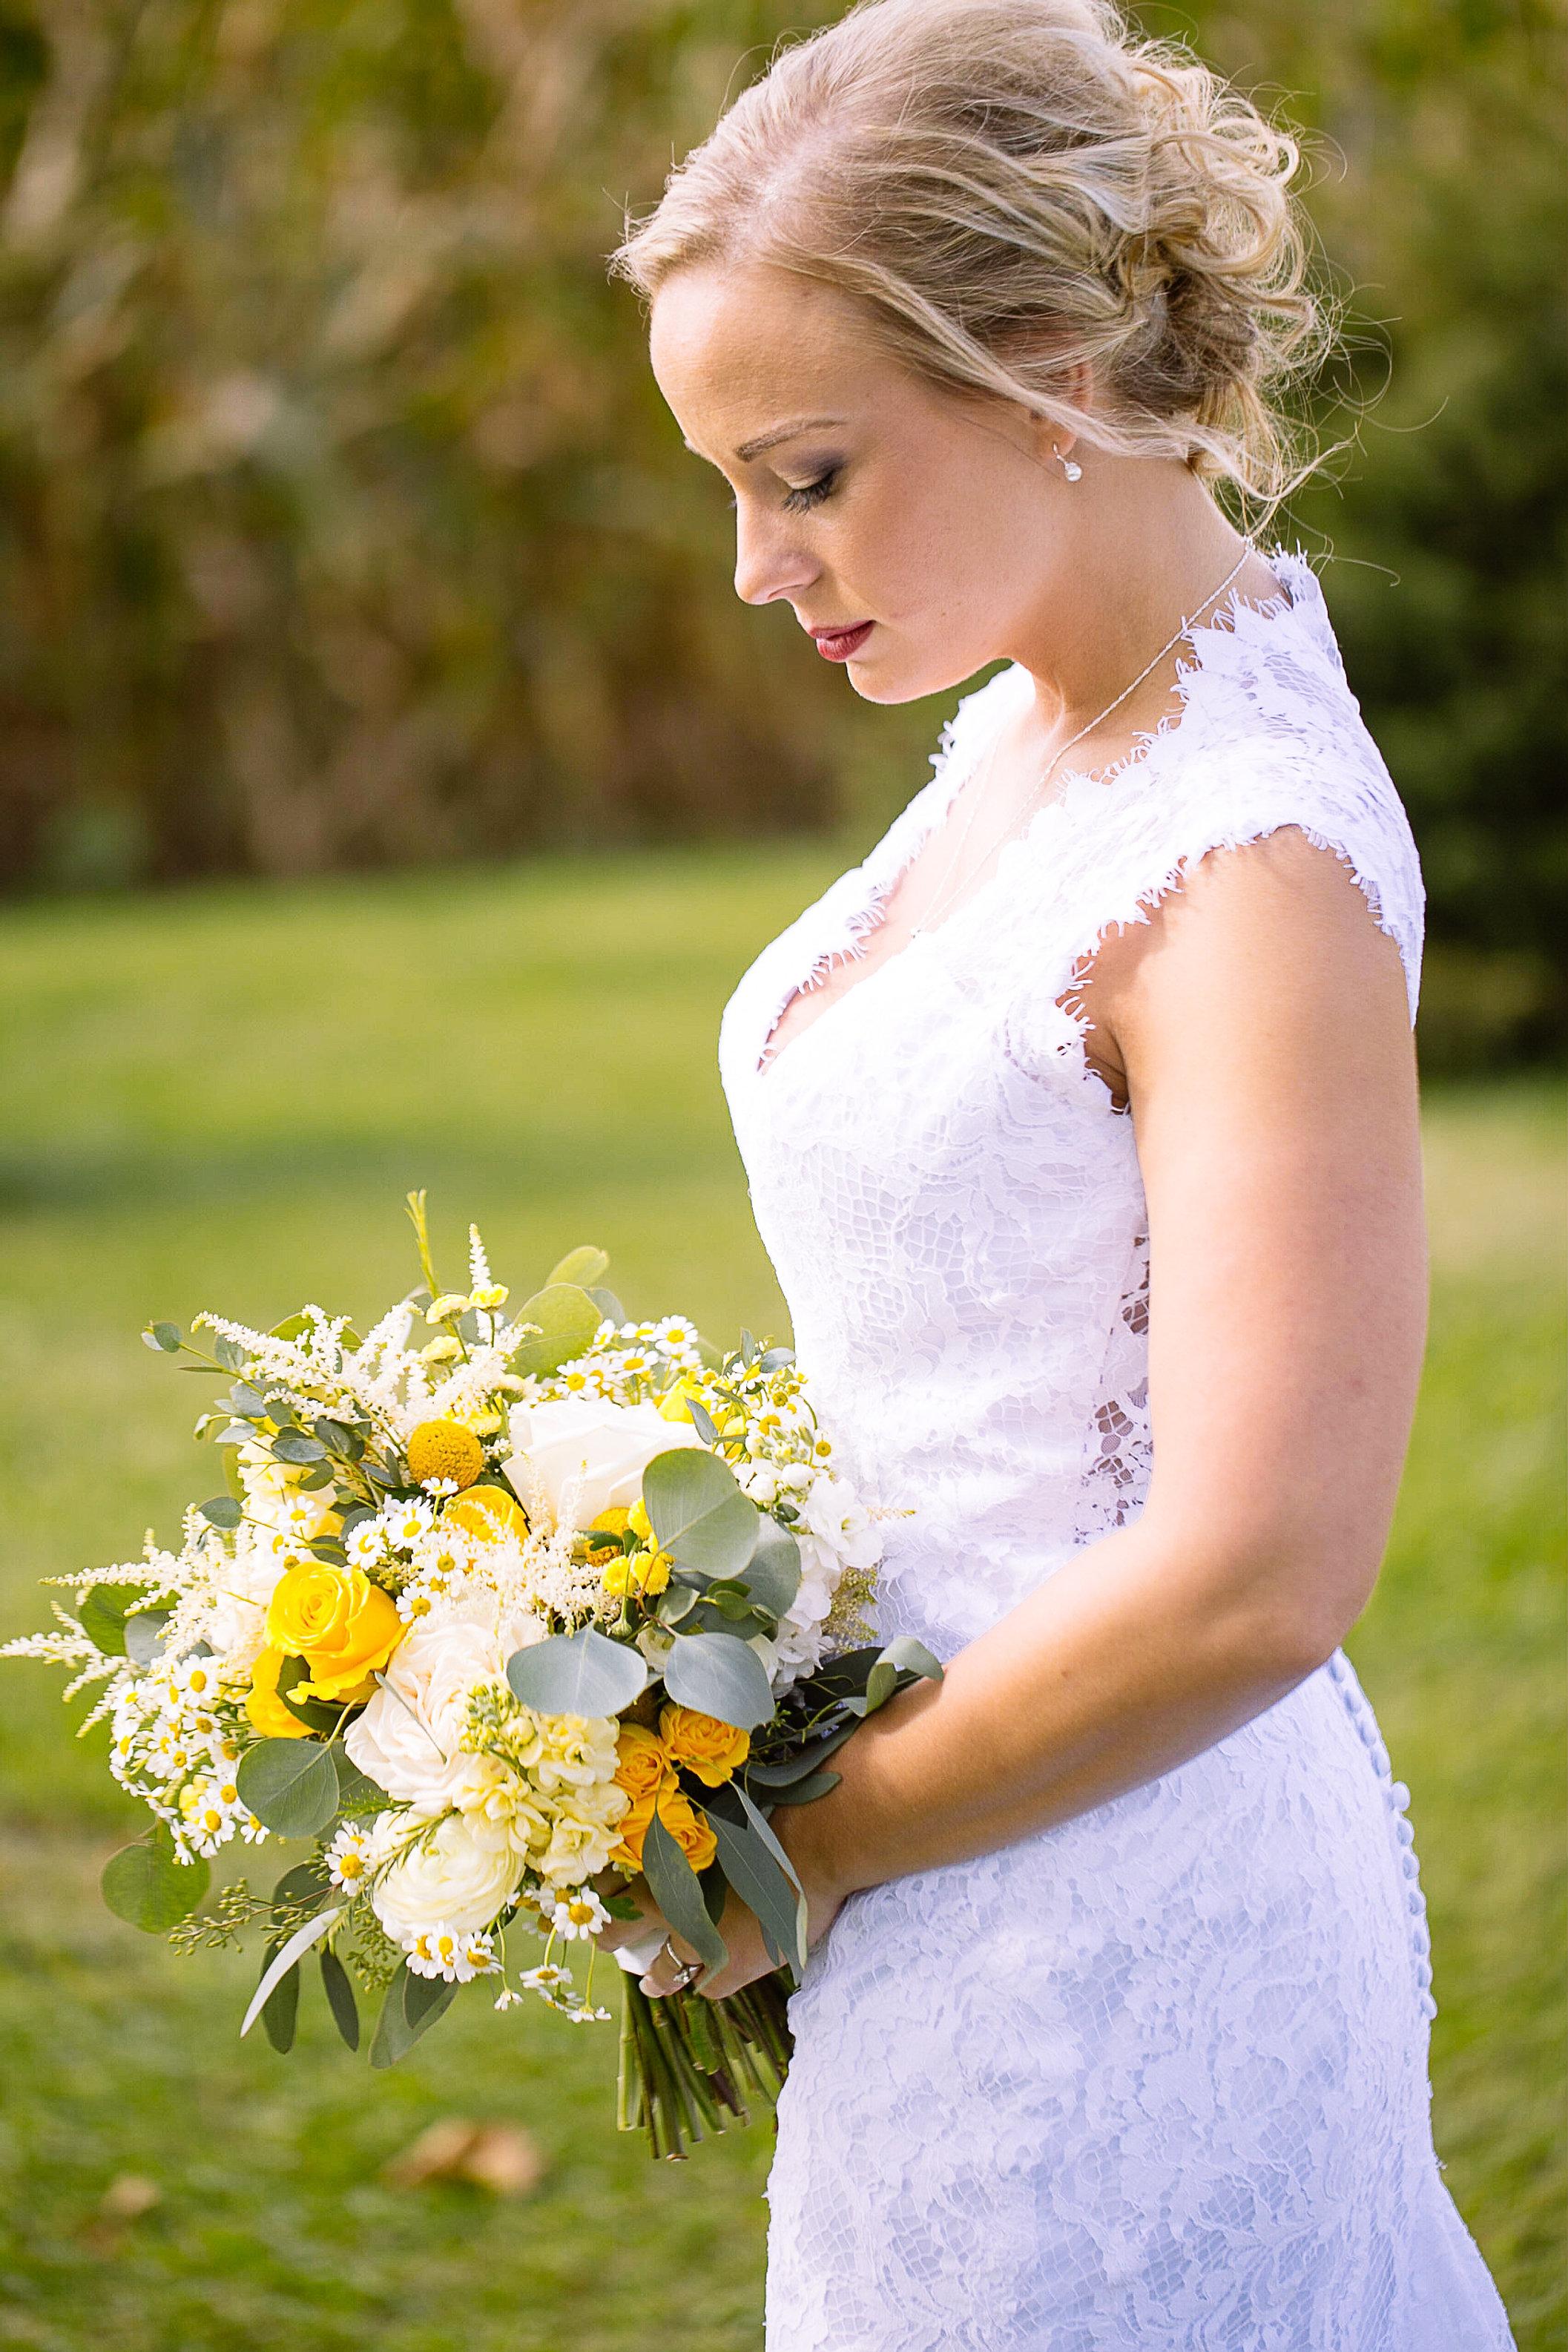 northwest indiana florist | lifestyle flowers & events